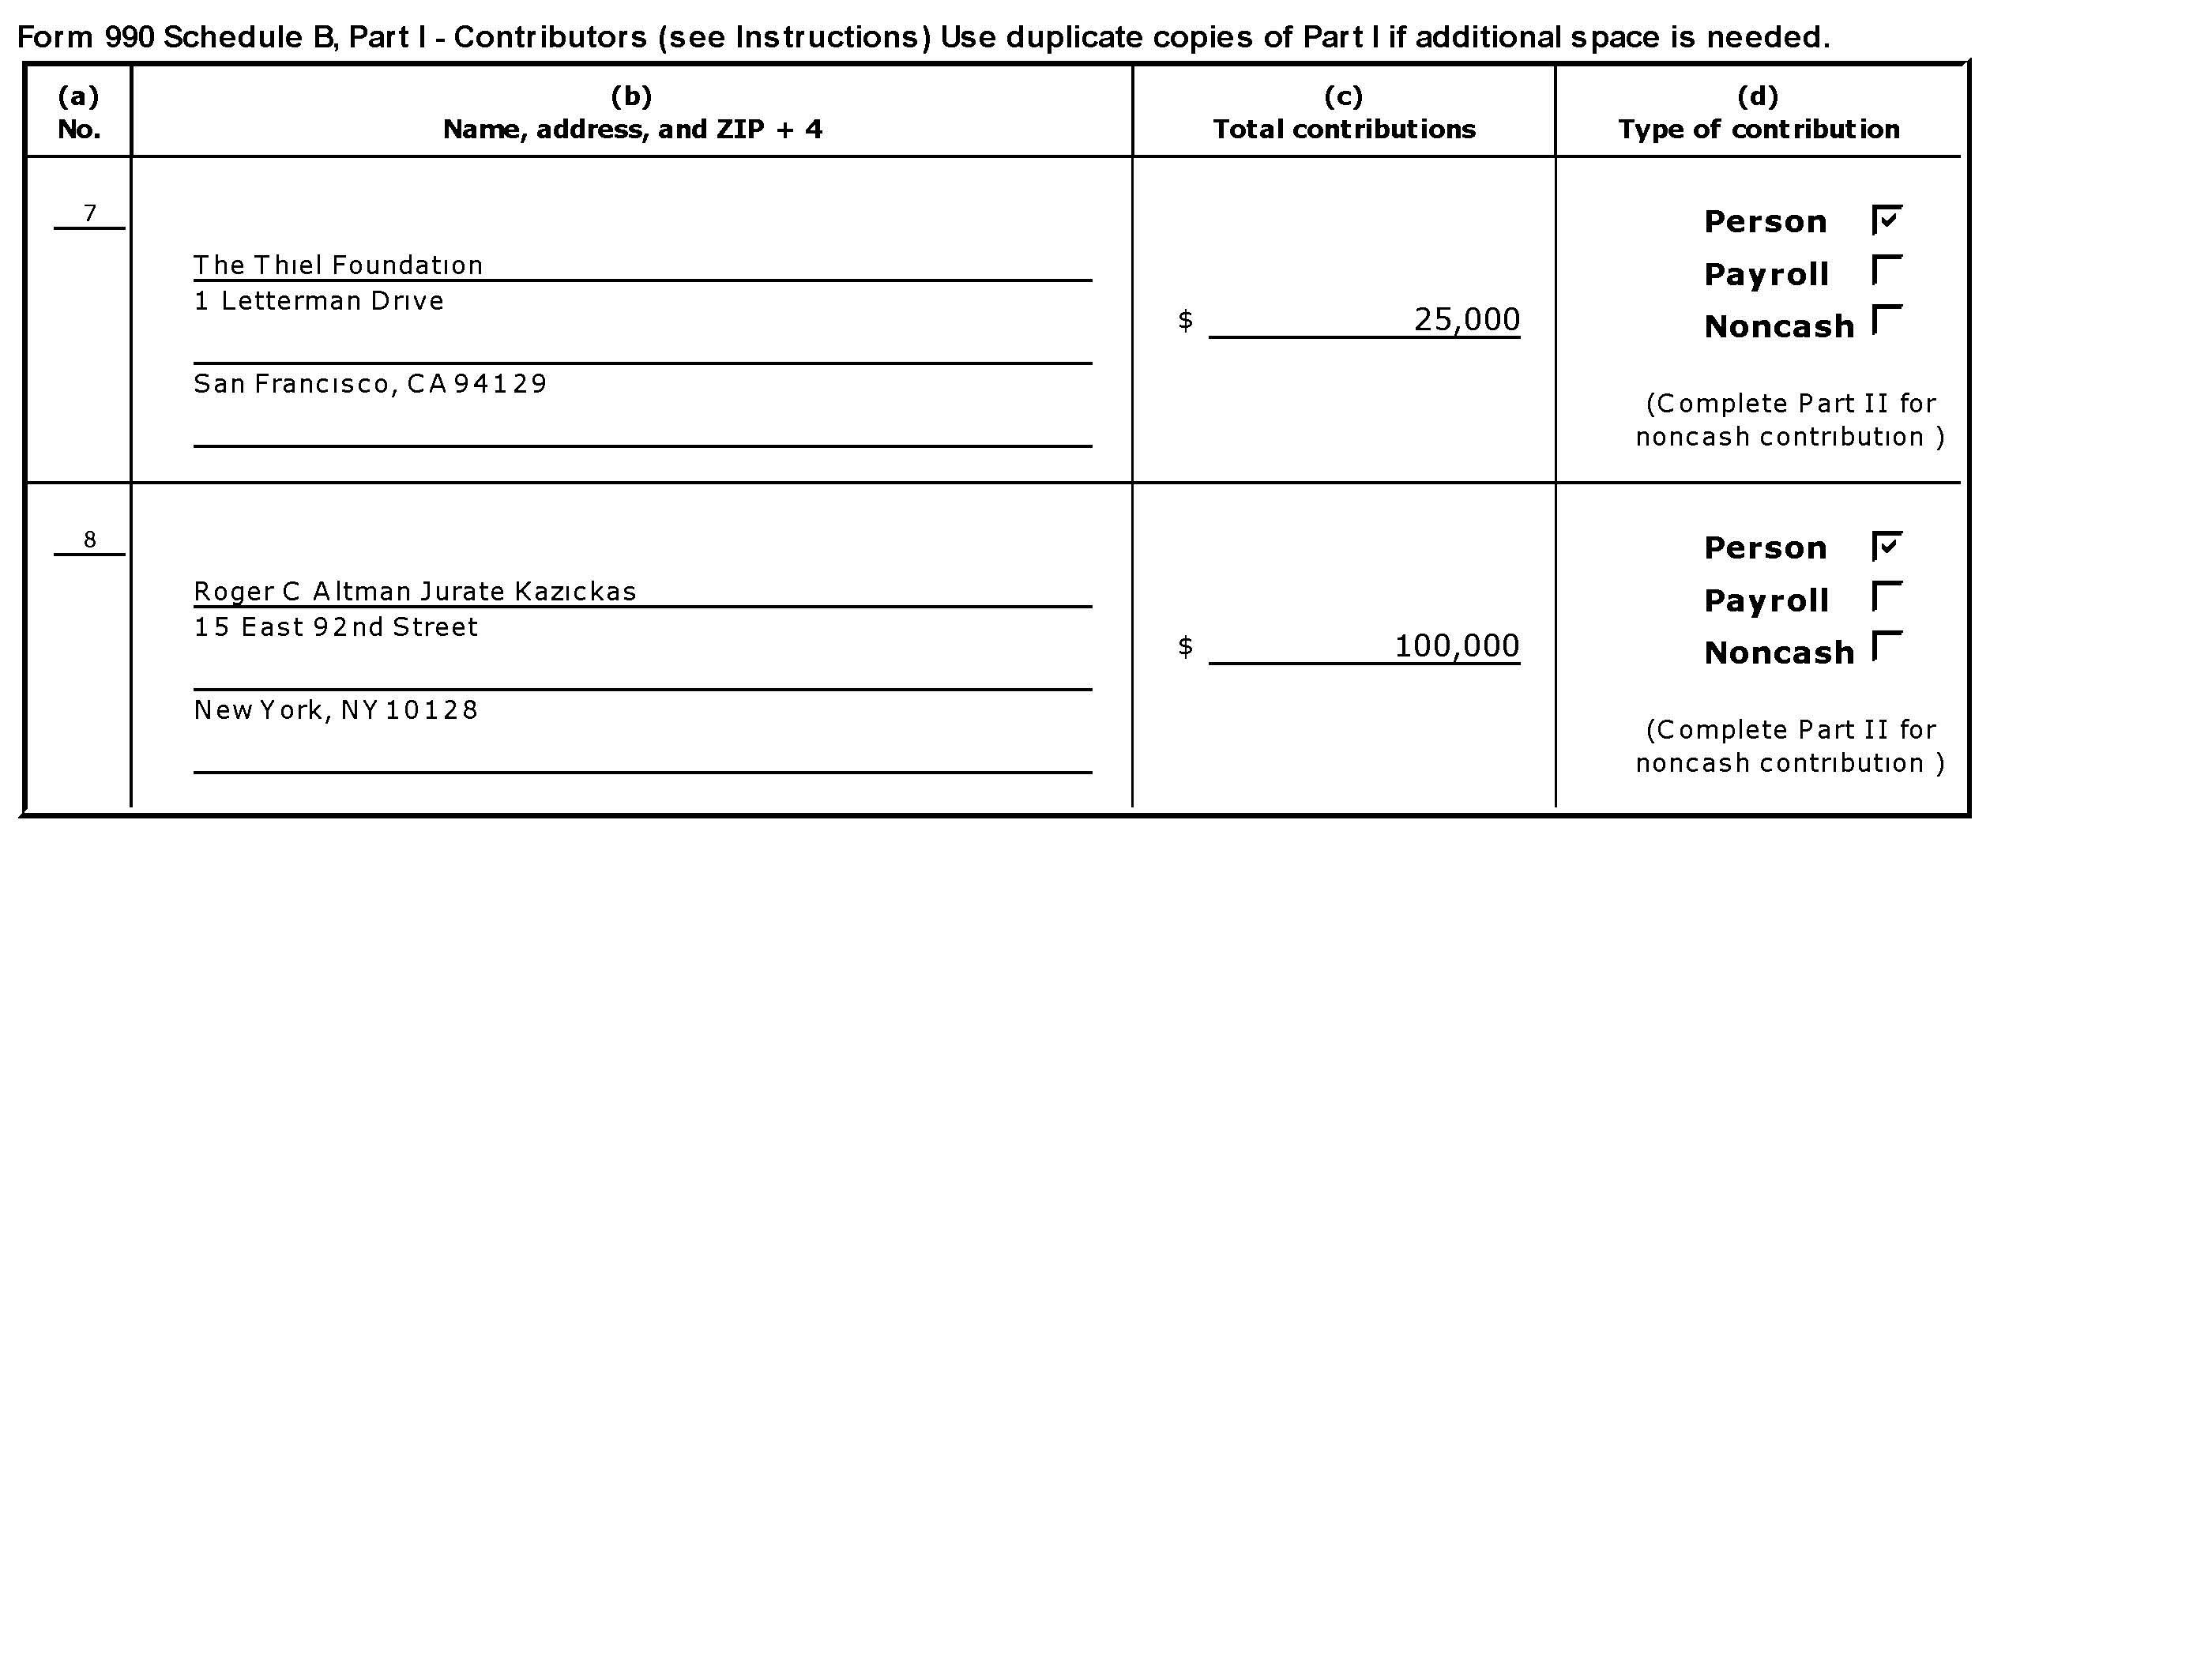 American Friends of Bilderberg 2014 Tax Return   Public